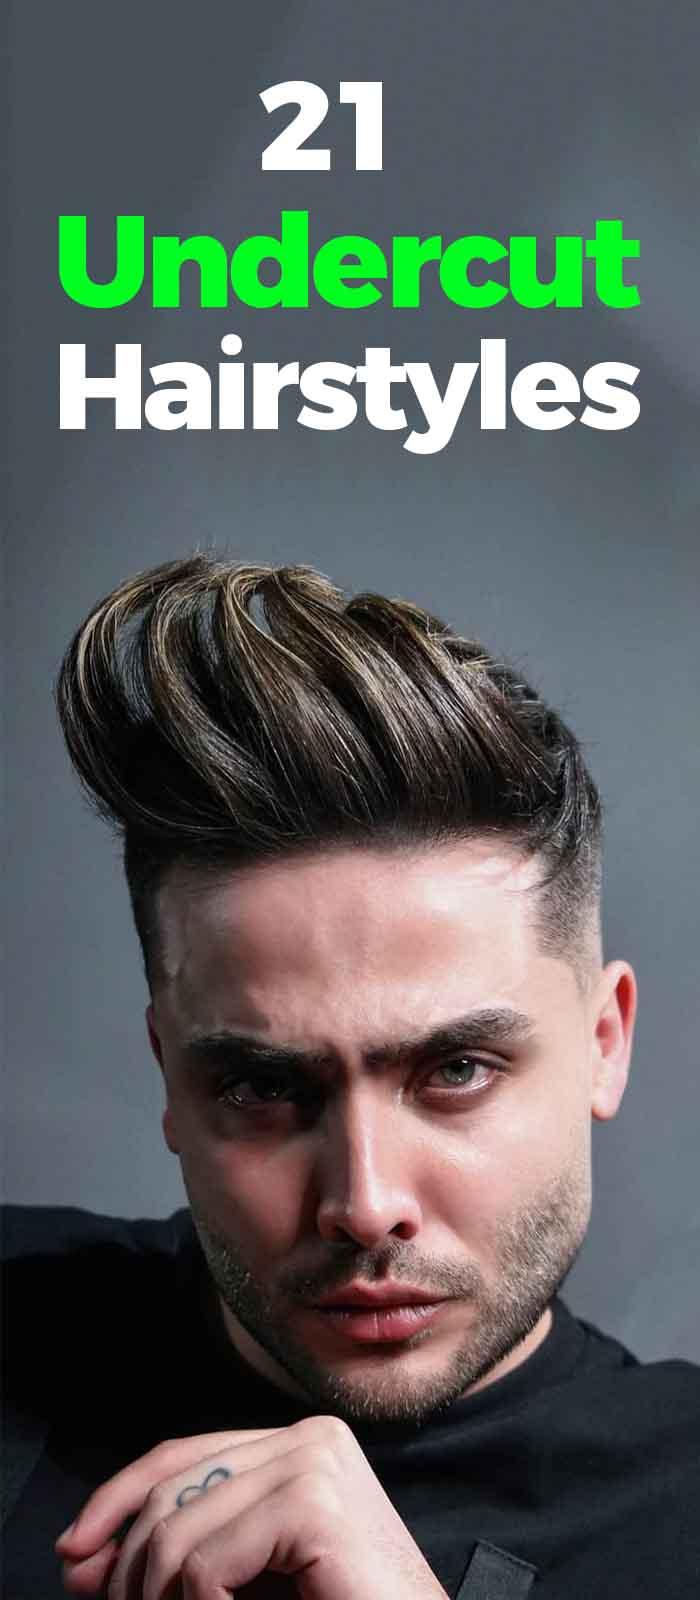 Undercut Hairstyles For Men 2019